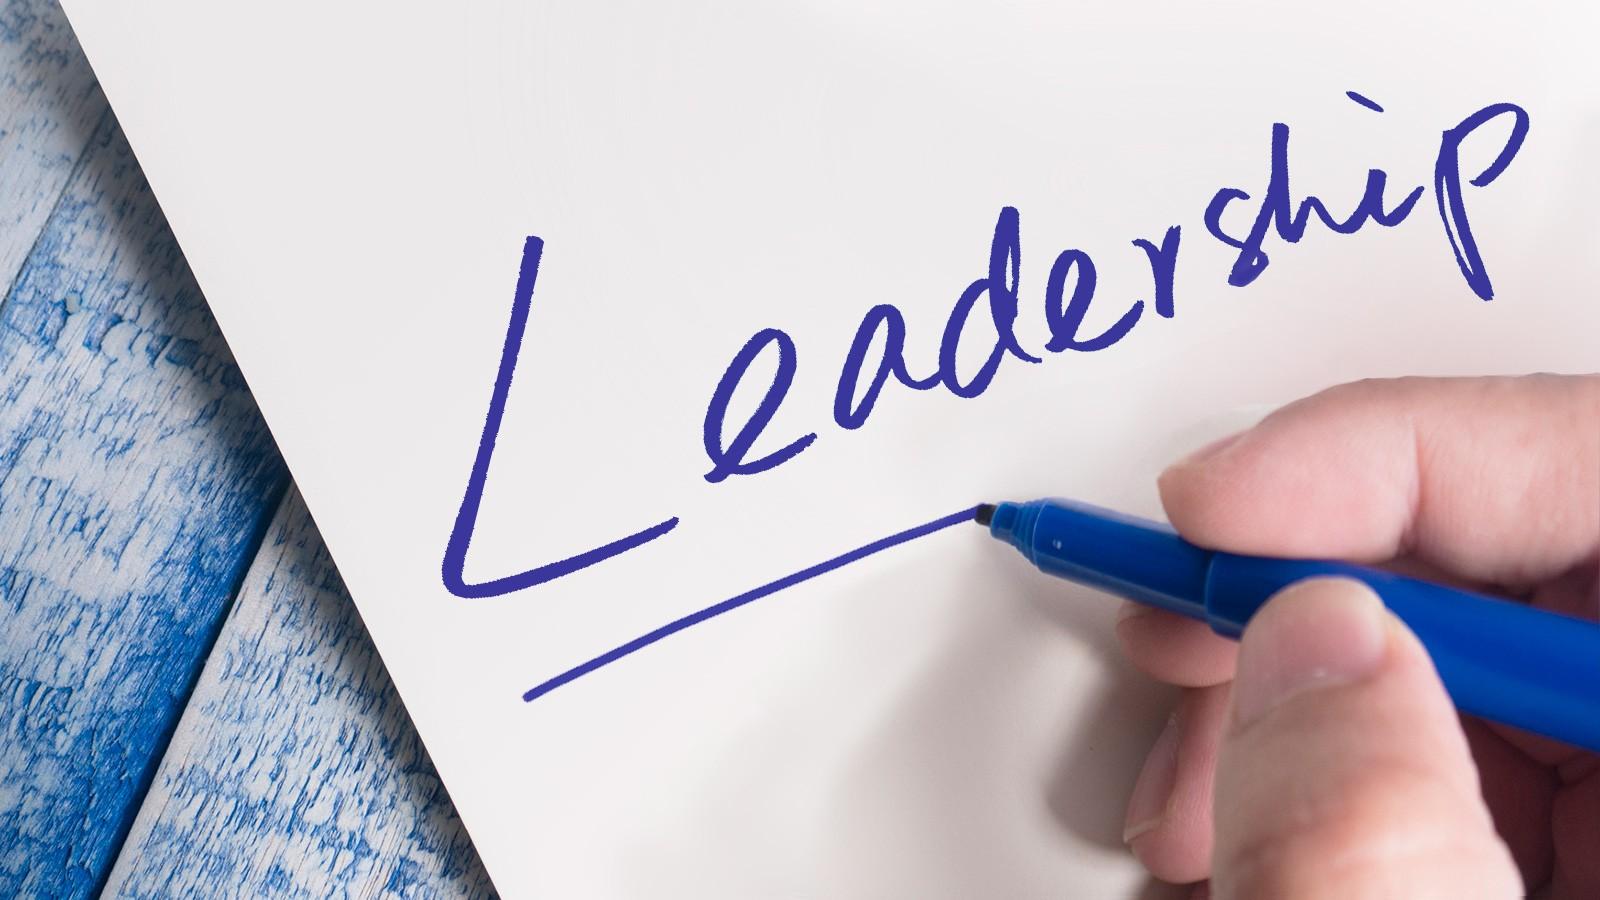 Writing a leadership essay